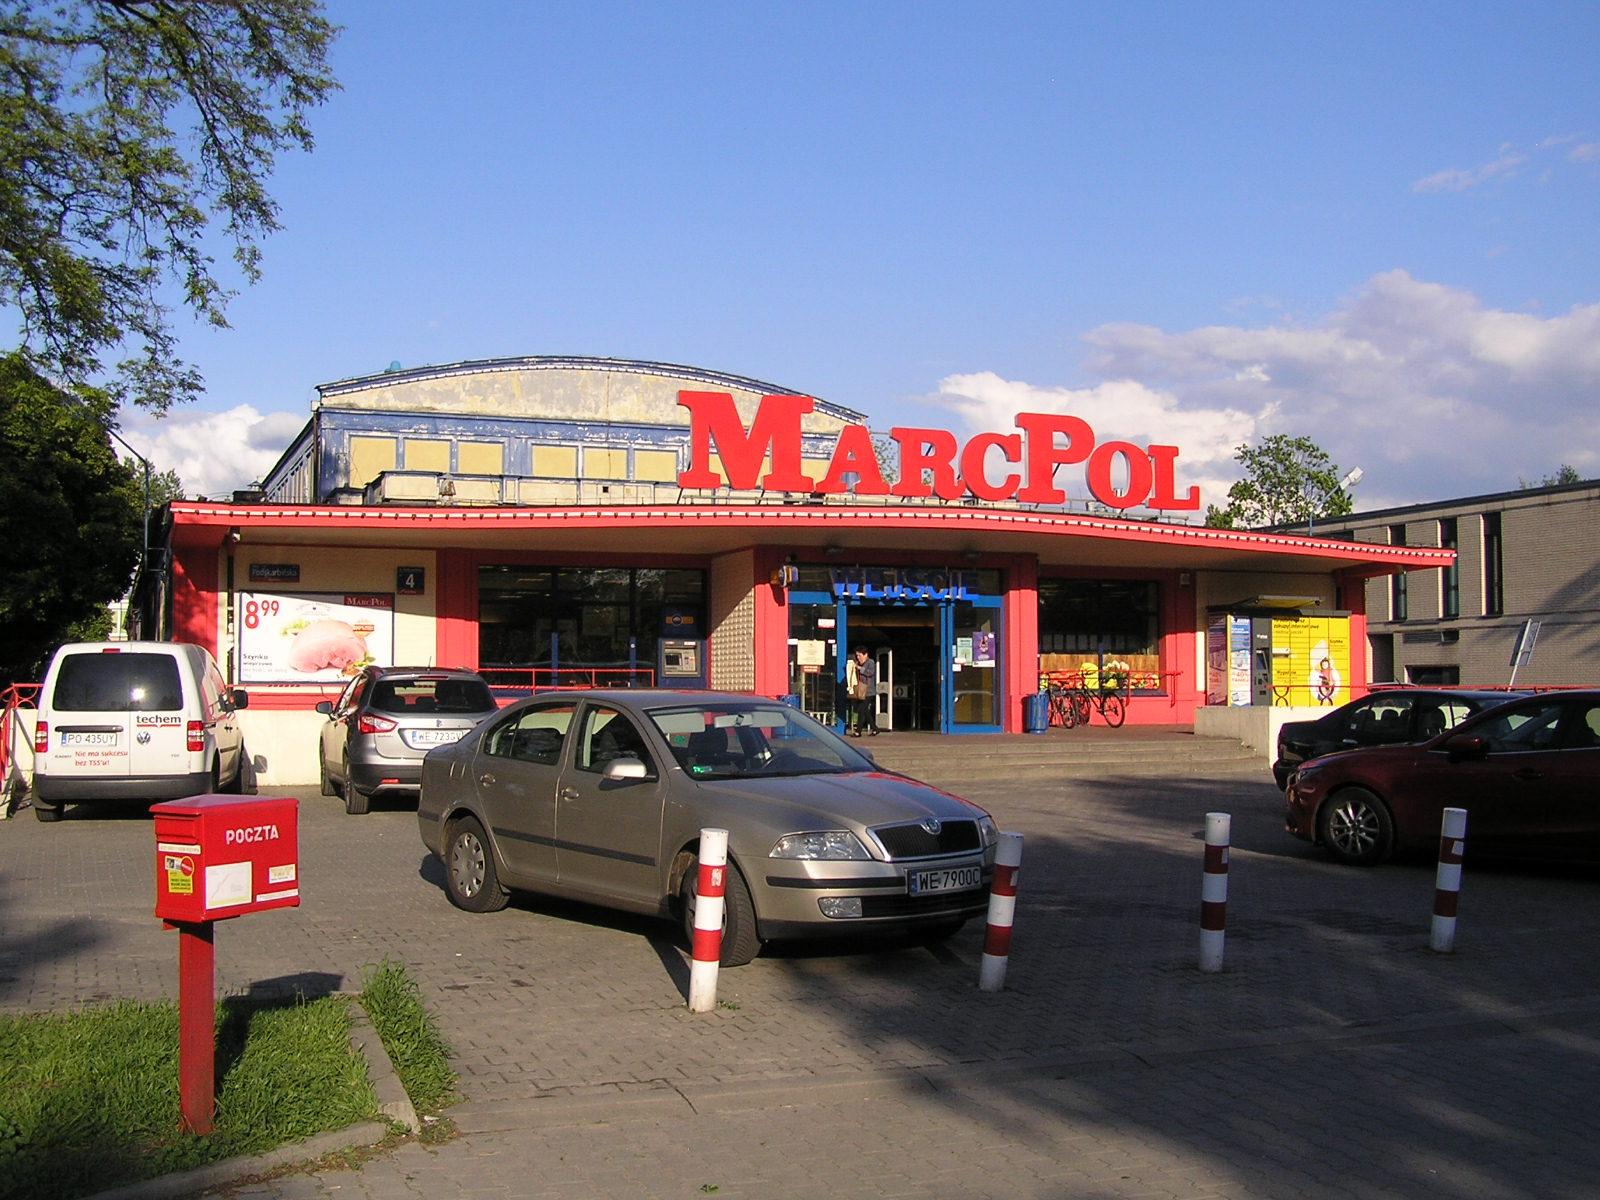 Podskarbińska 4